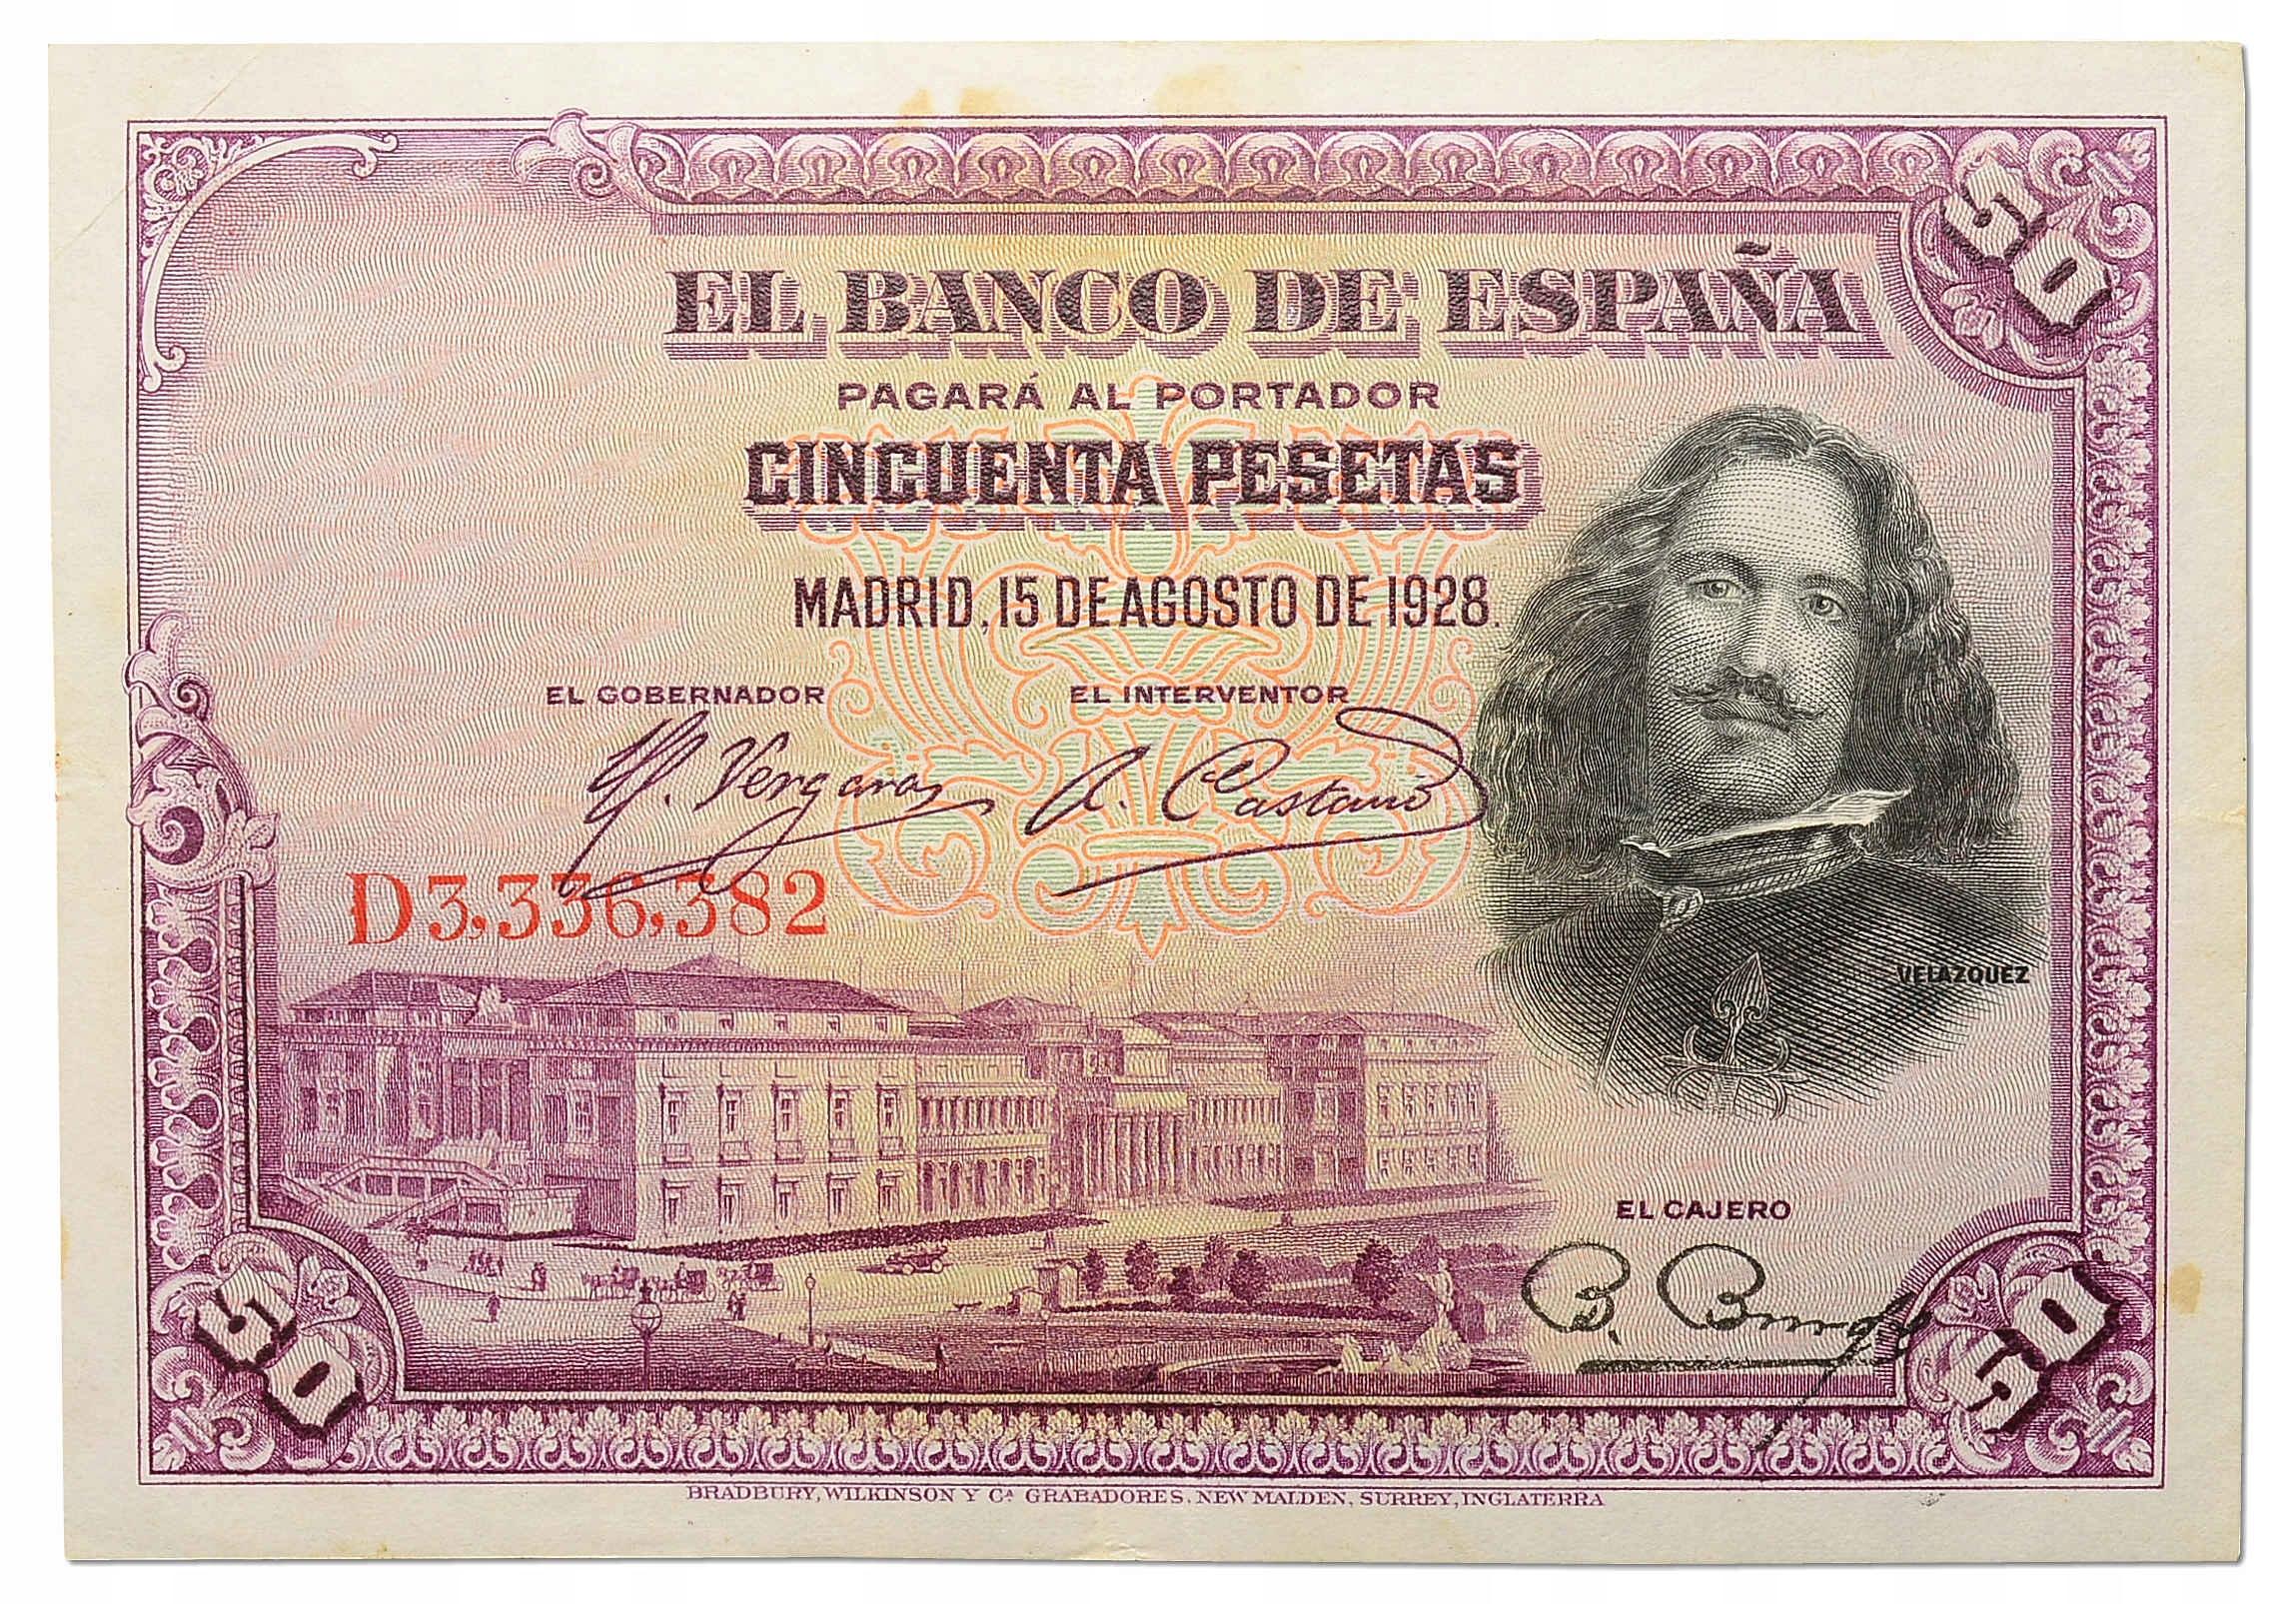 8.Hiszpania, 50 Peset 1928, P.75.b, St.3+